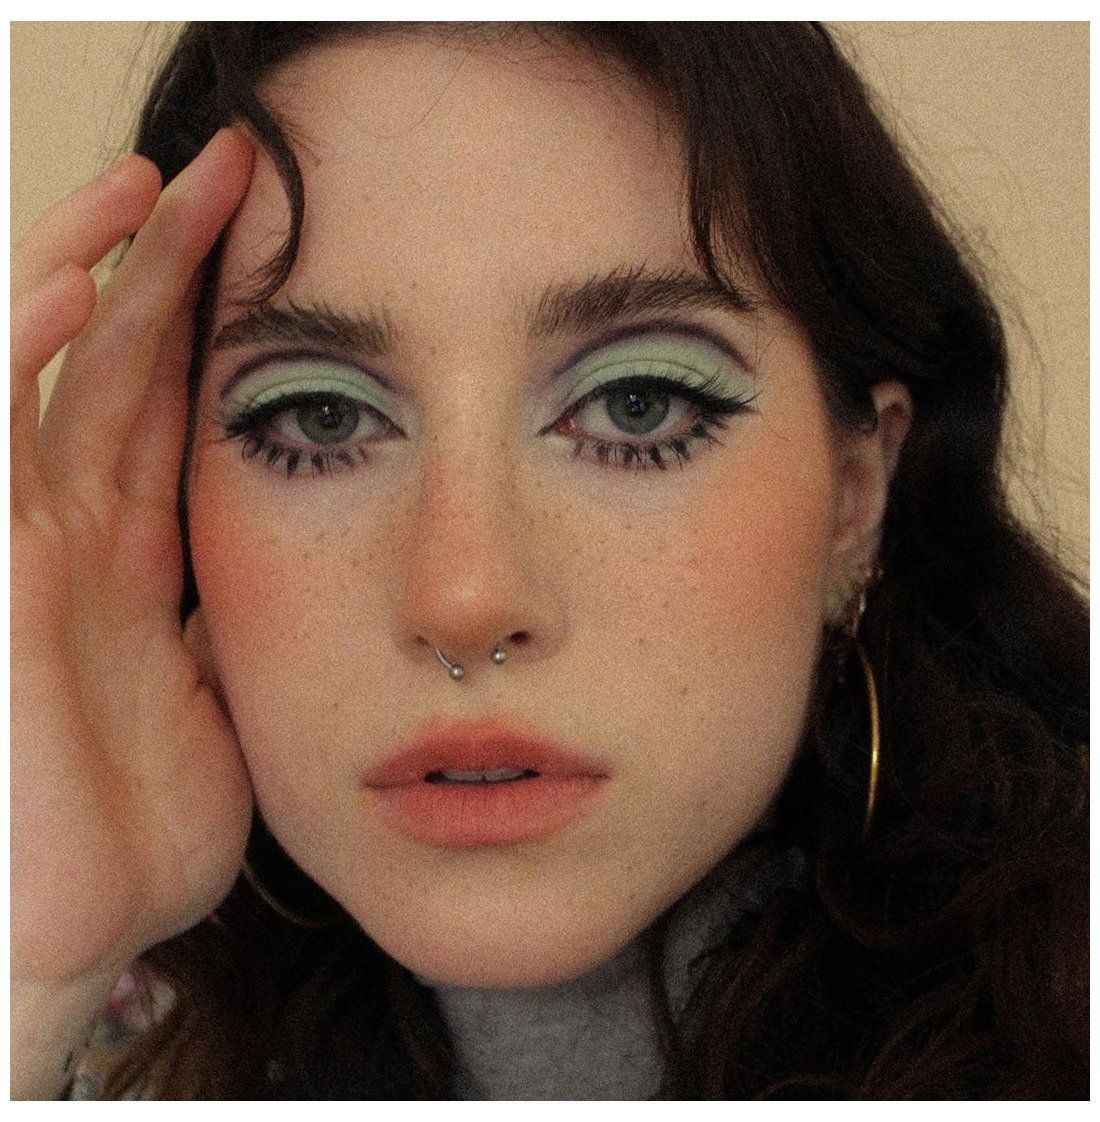 60s makeup aesthetic